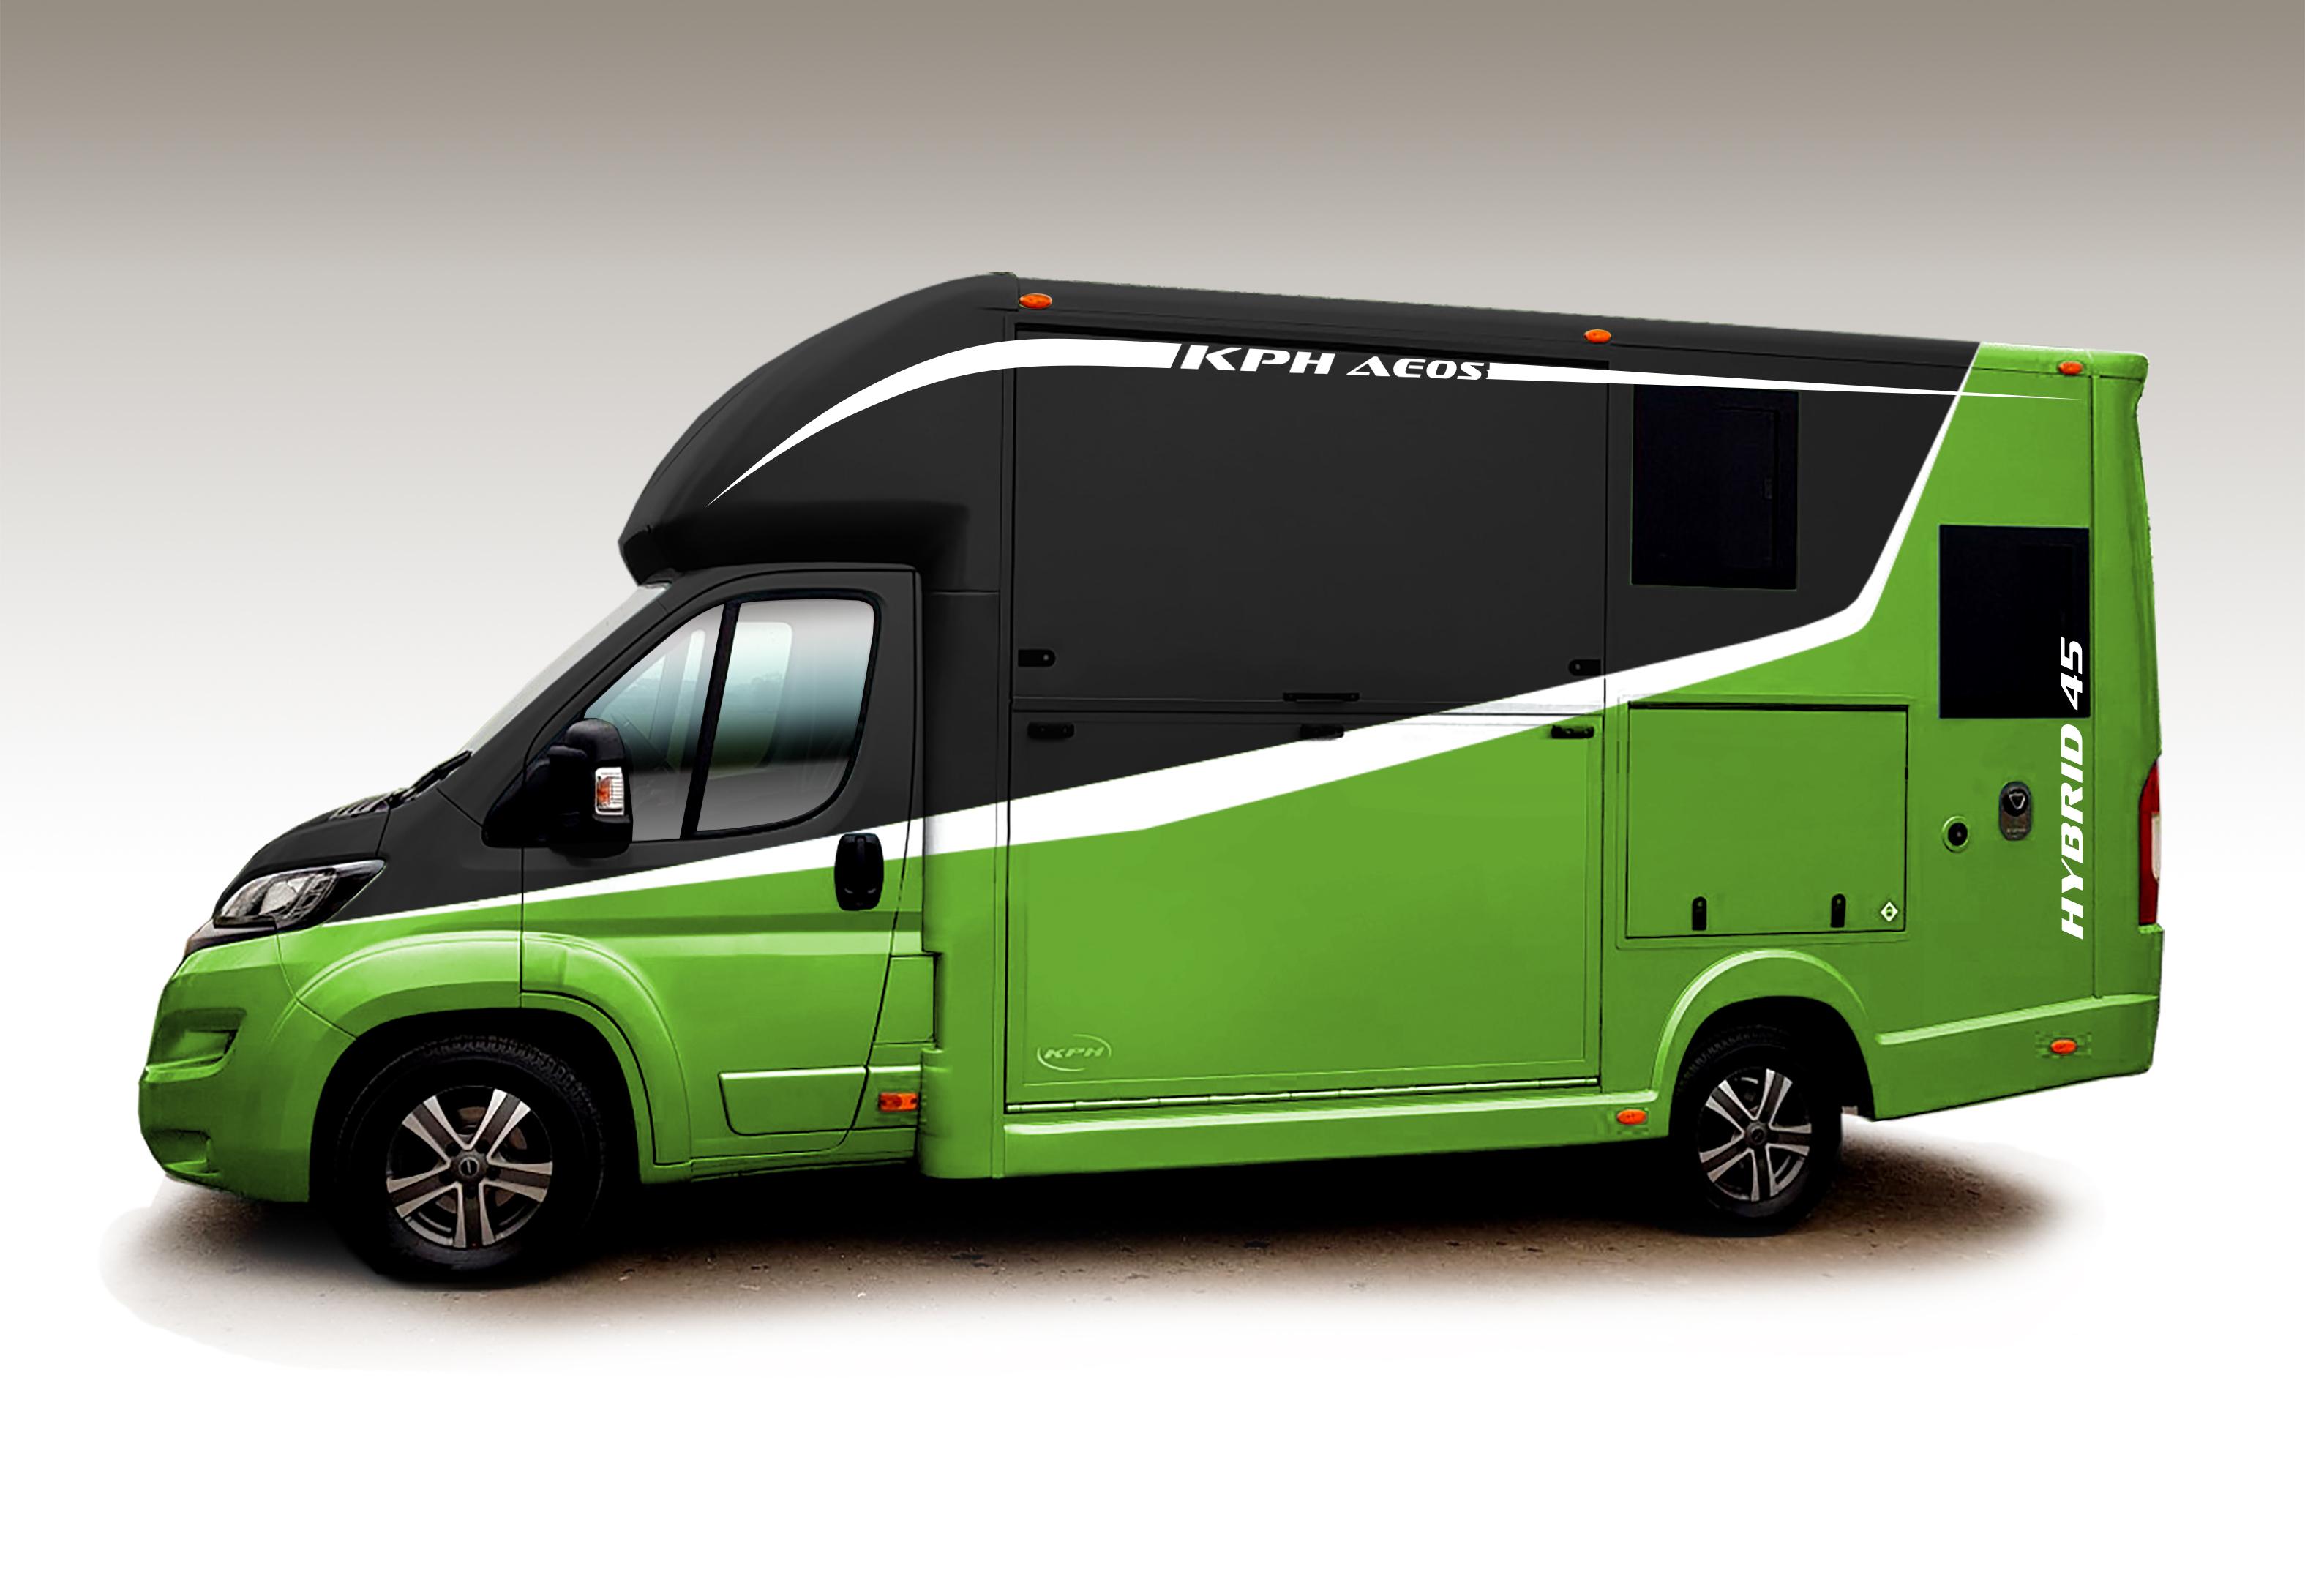 KPH Aeos Hybrid 2020 Green